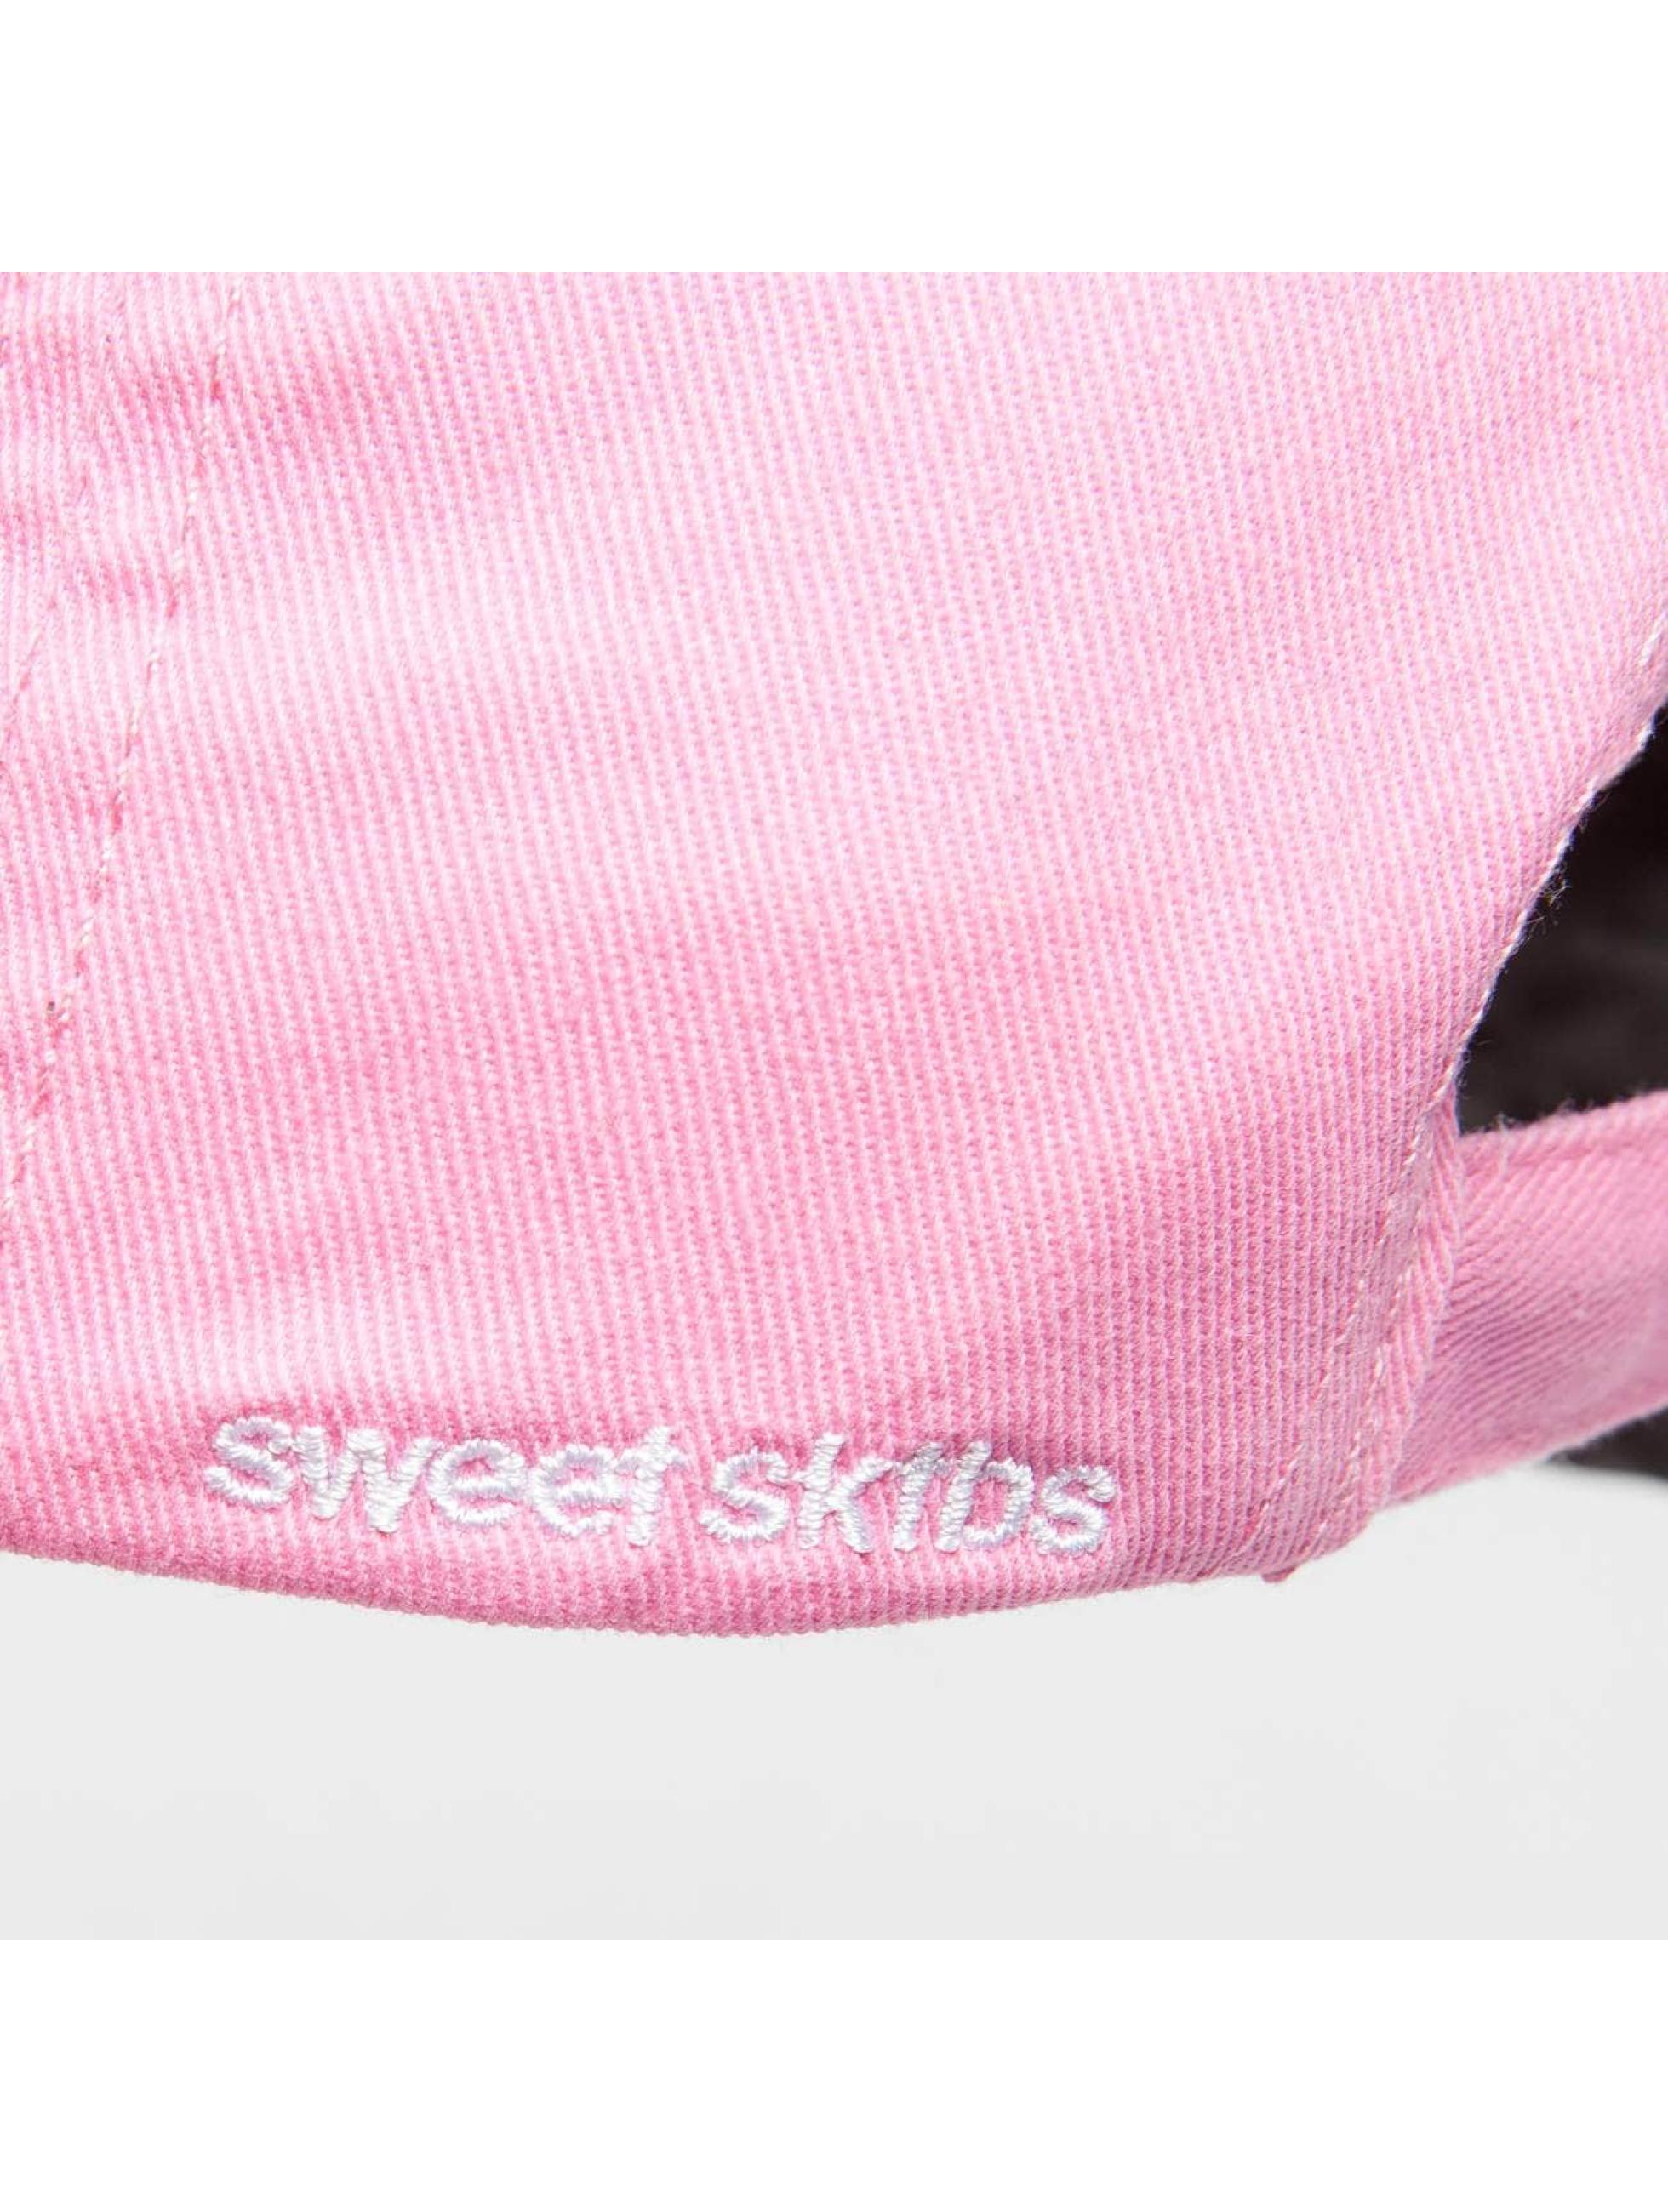 Sweet SKTBS Casquette Snapback & Strapback Pepsi Gone magenta